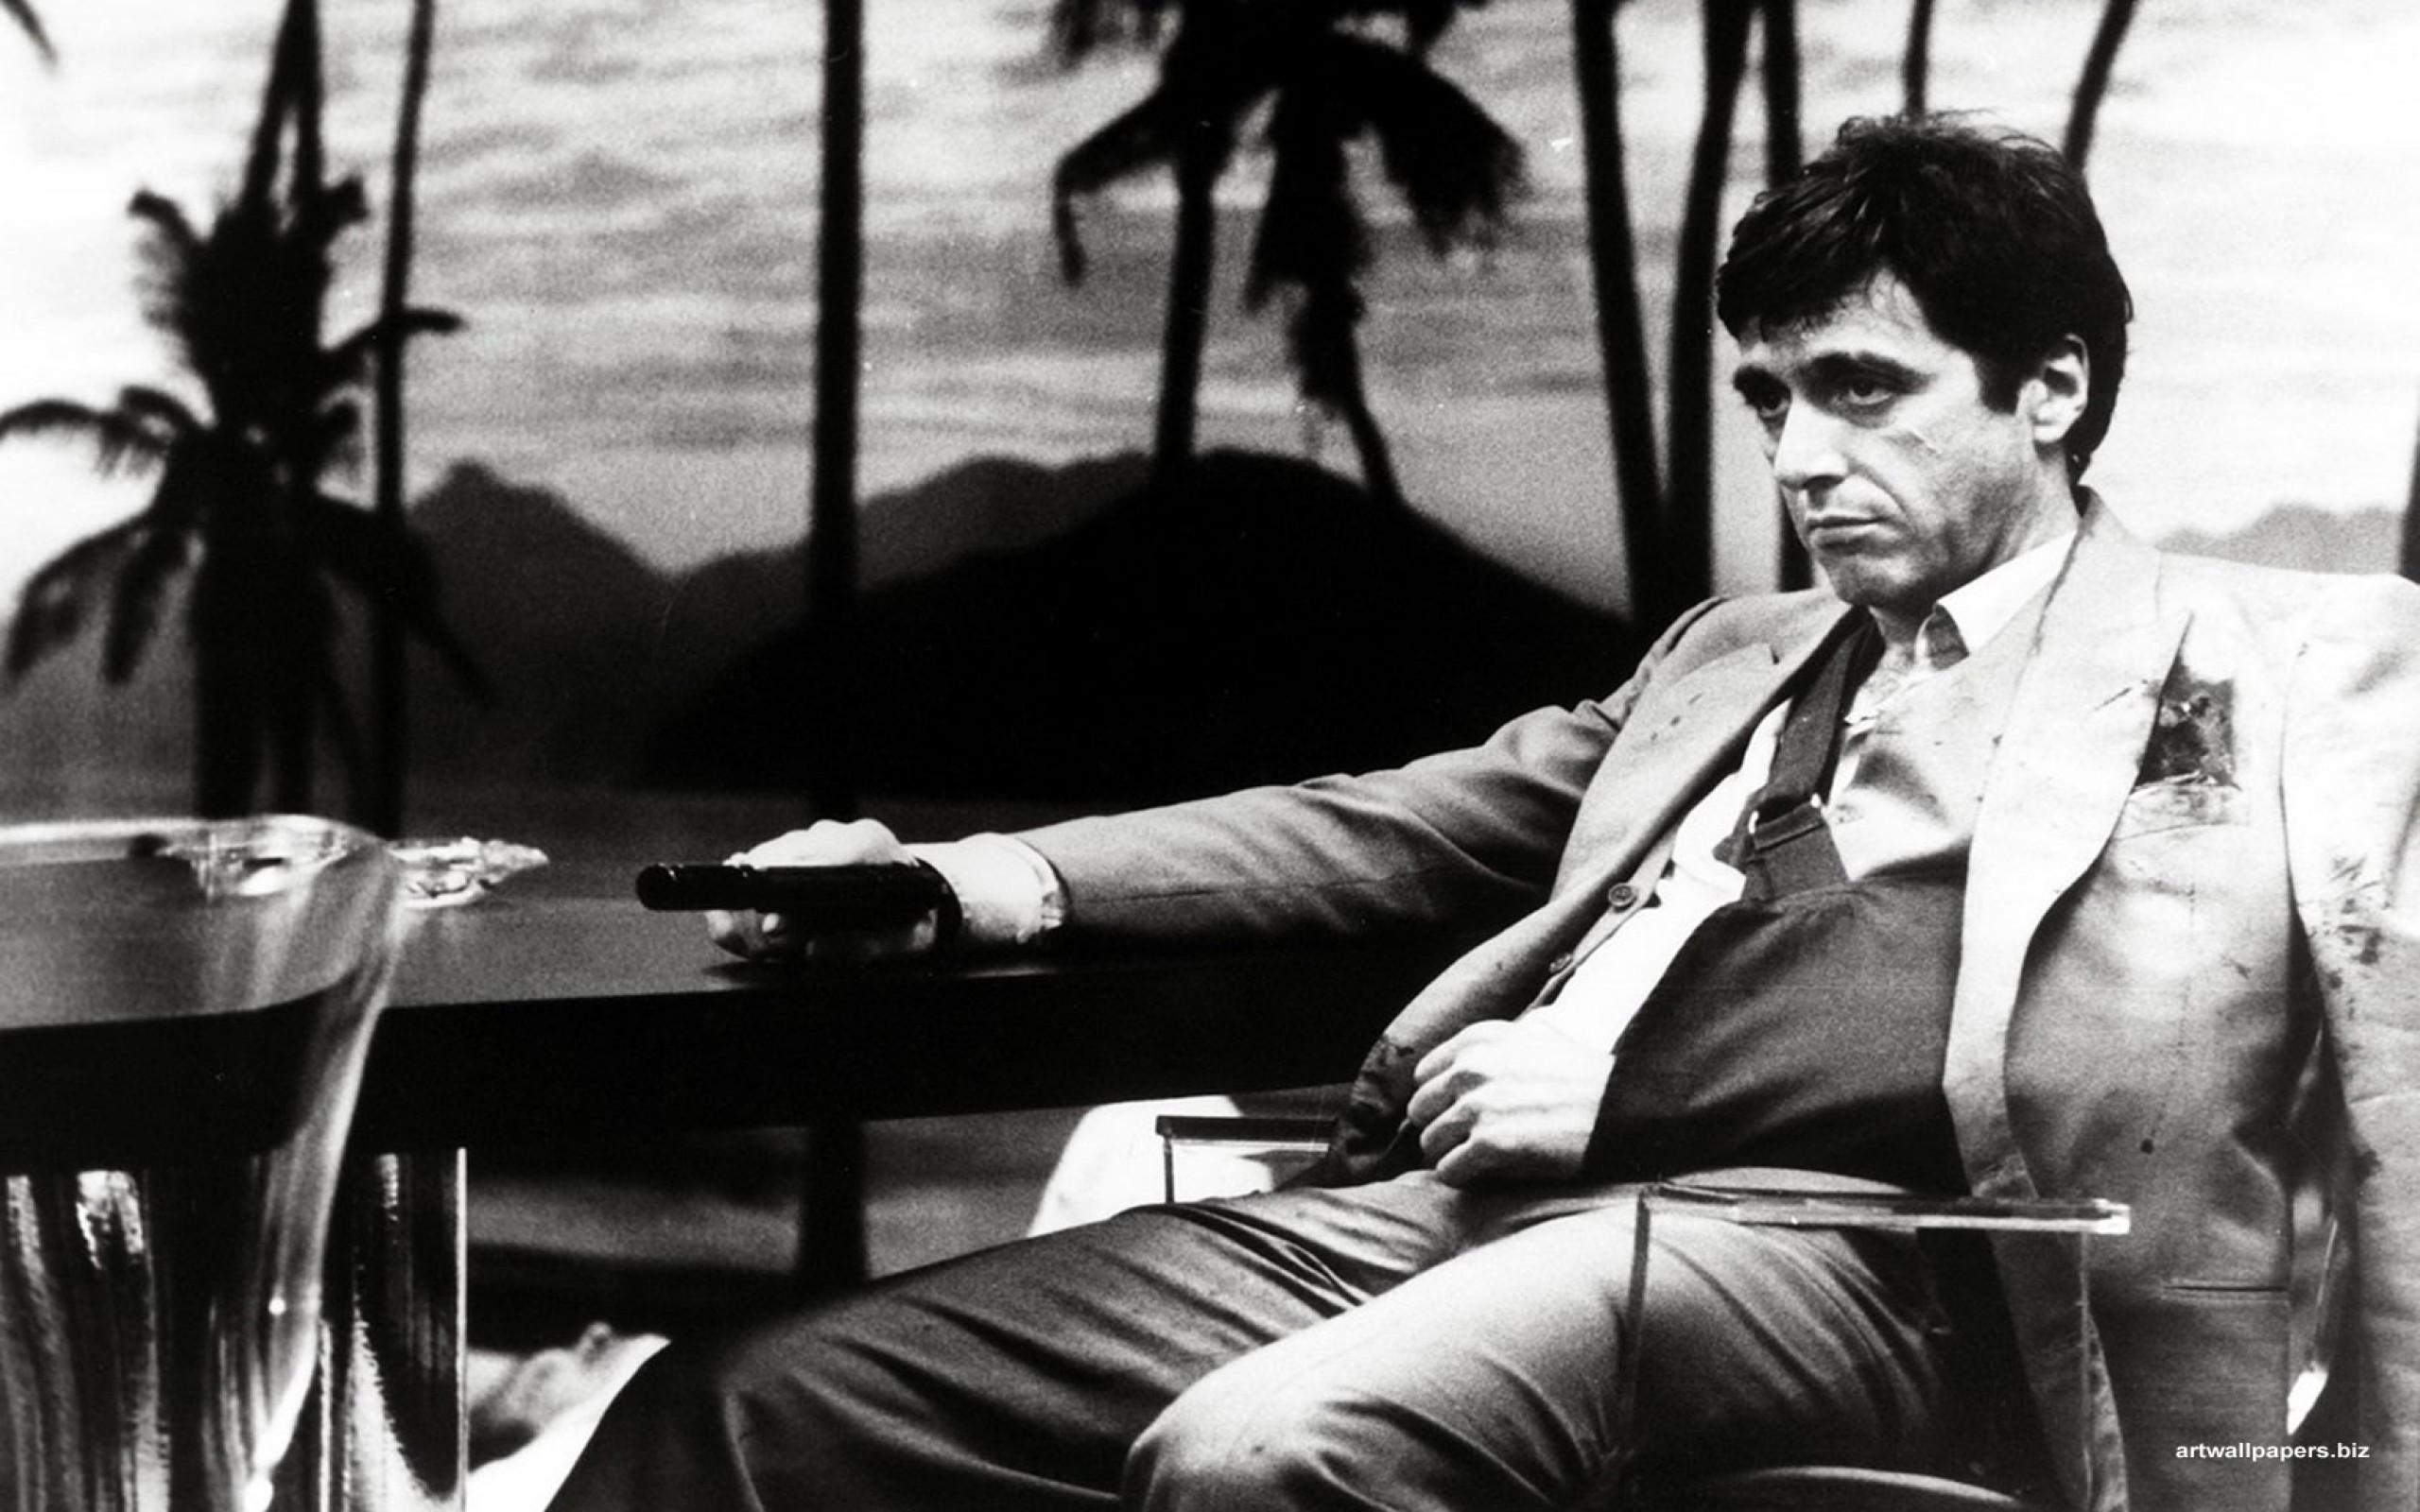 Al Pacino in Scarface directed by Brian De Palma, 1983